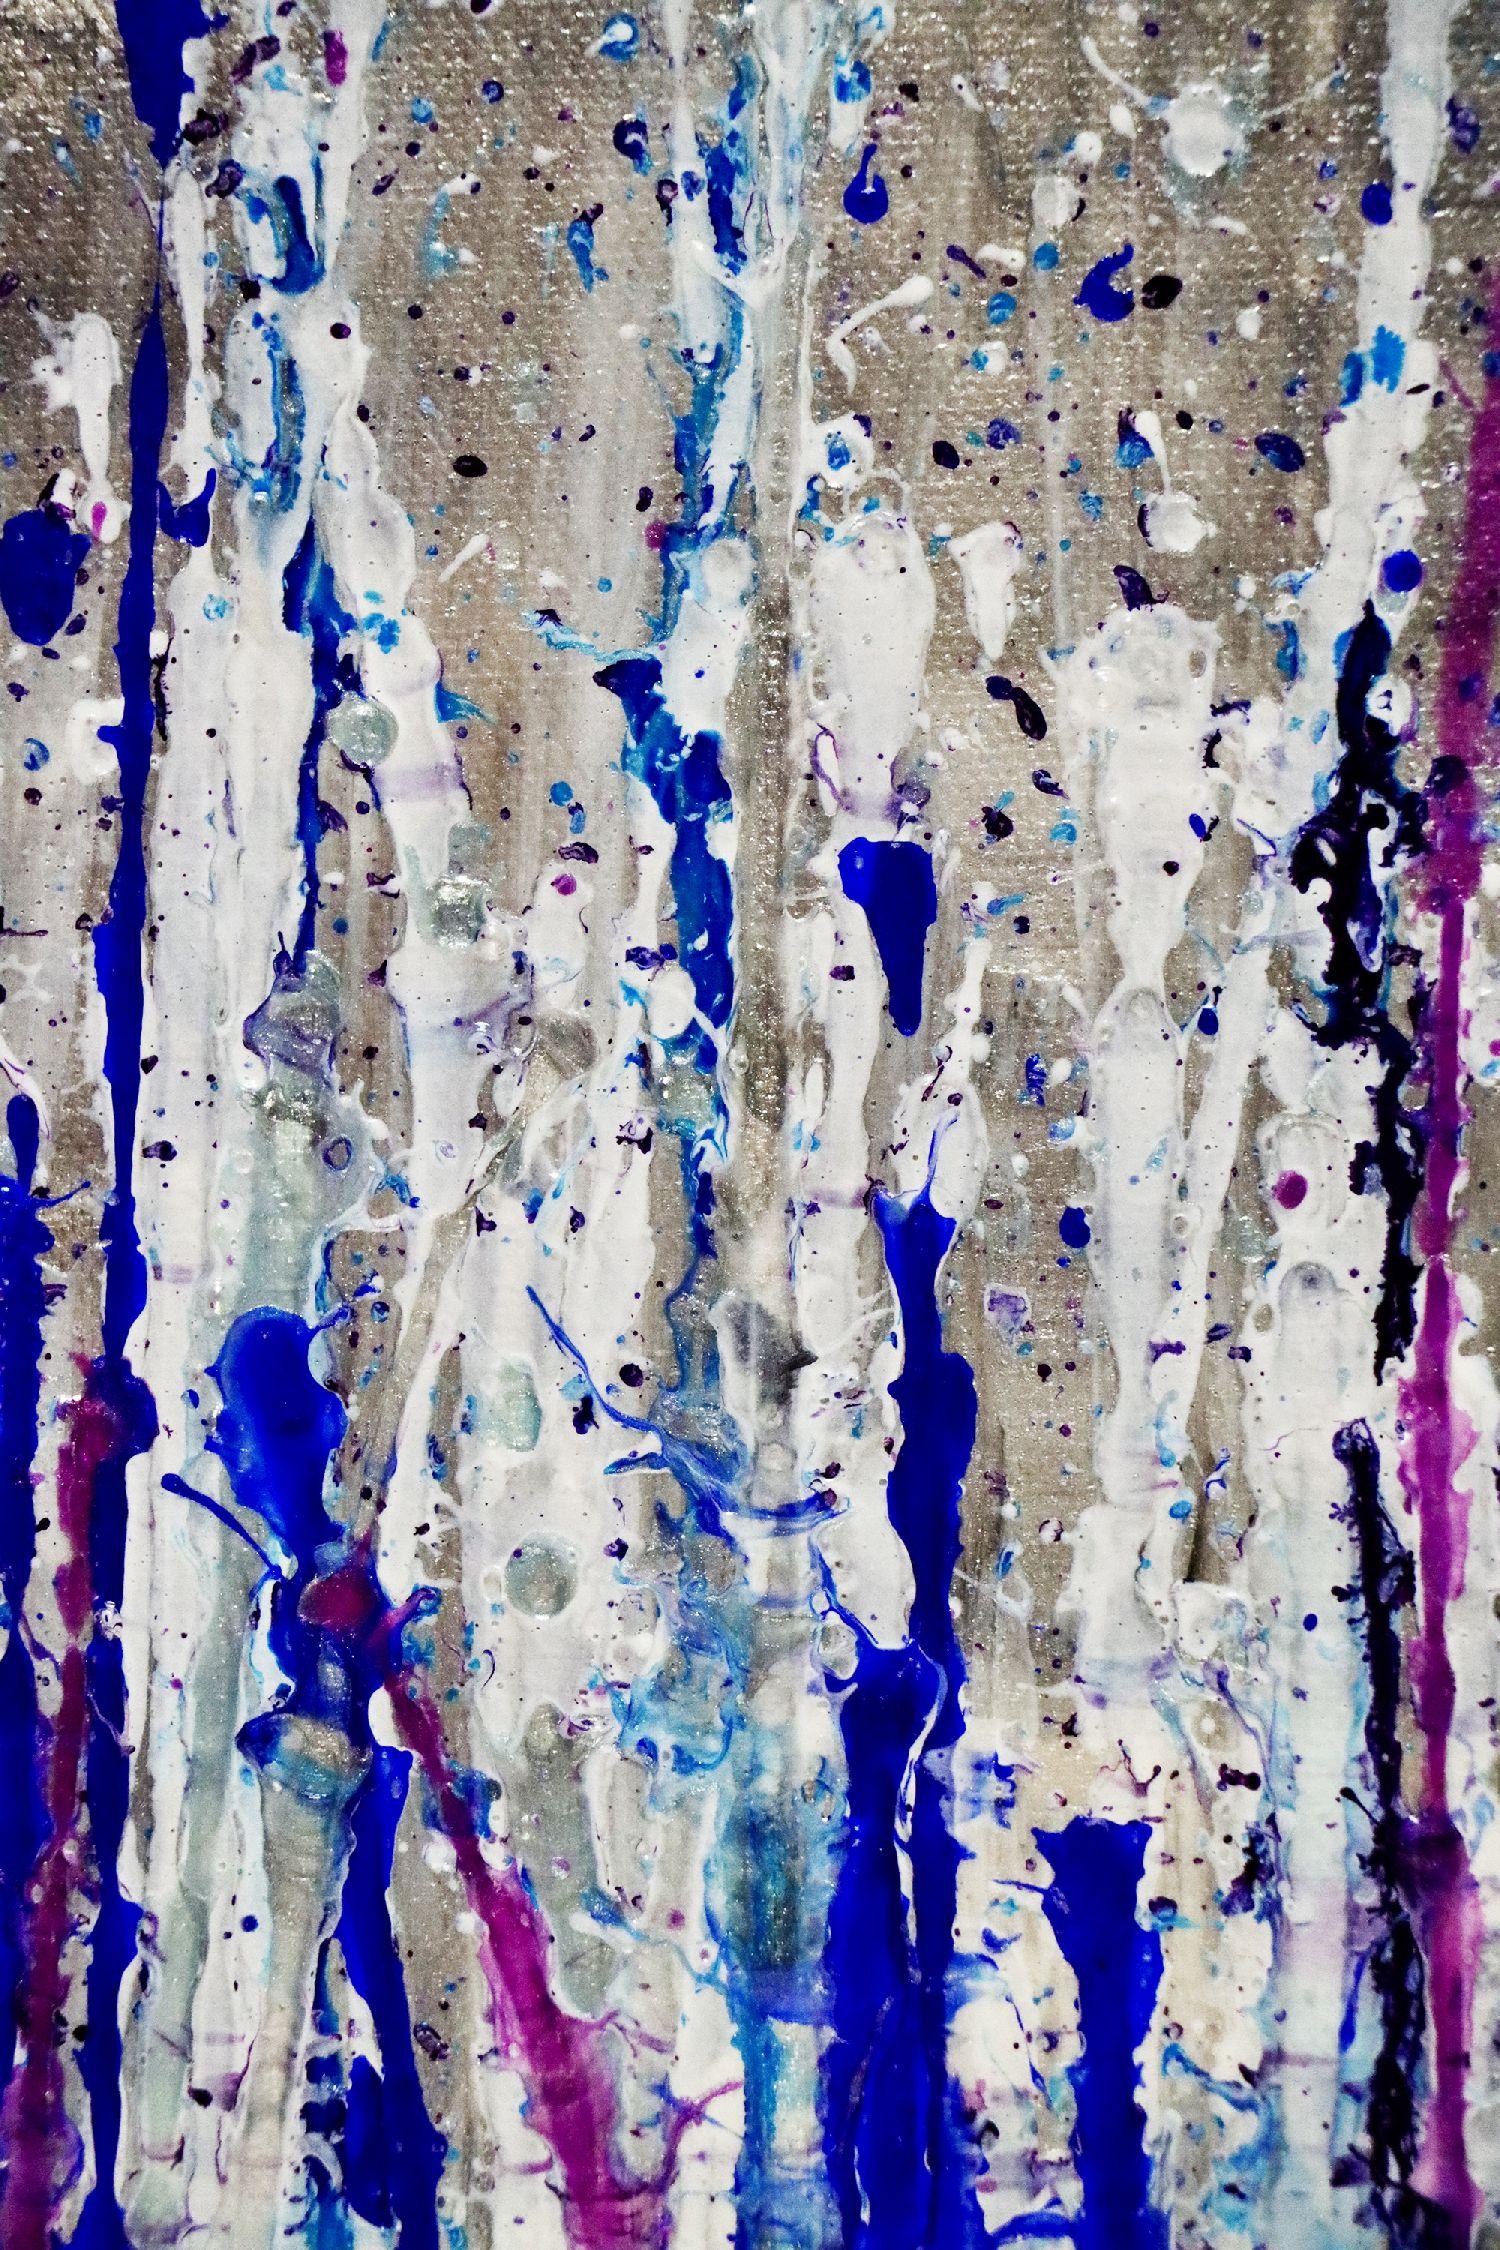 Detail - Daring Spectra (Purple Drizzles) (2020) by Nestor Toro